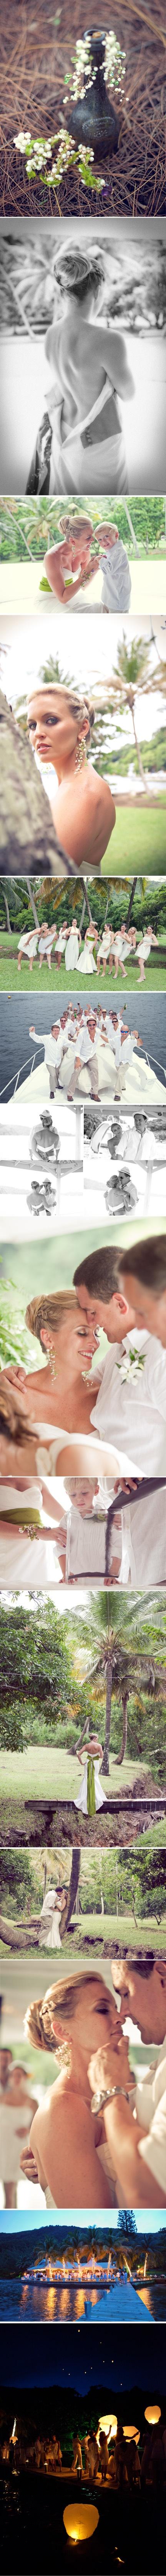 Luxury Cheap Wedding Rings Trinidad